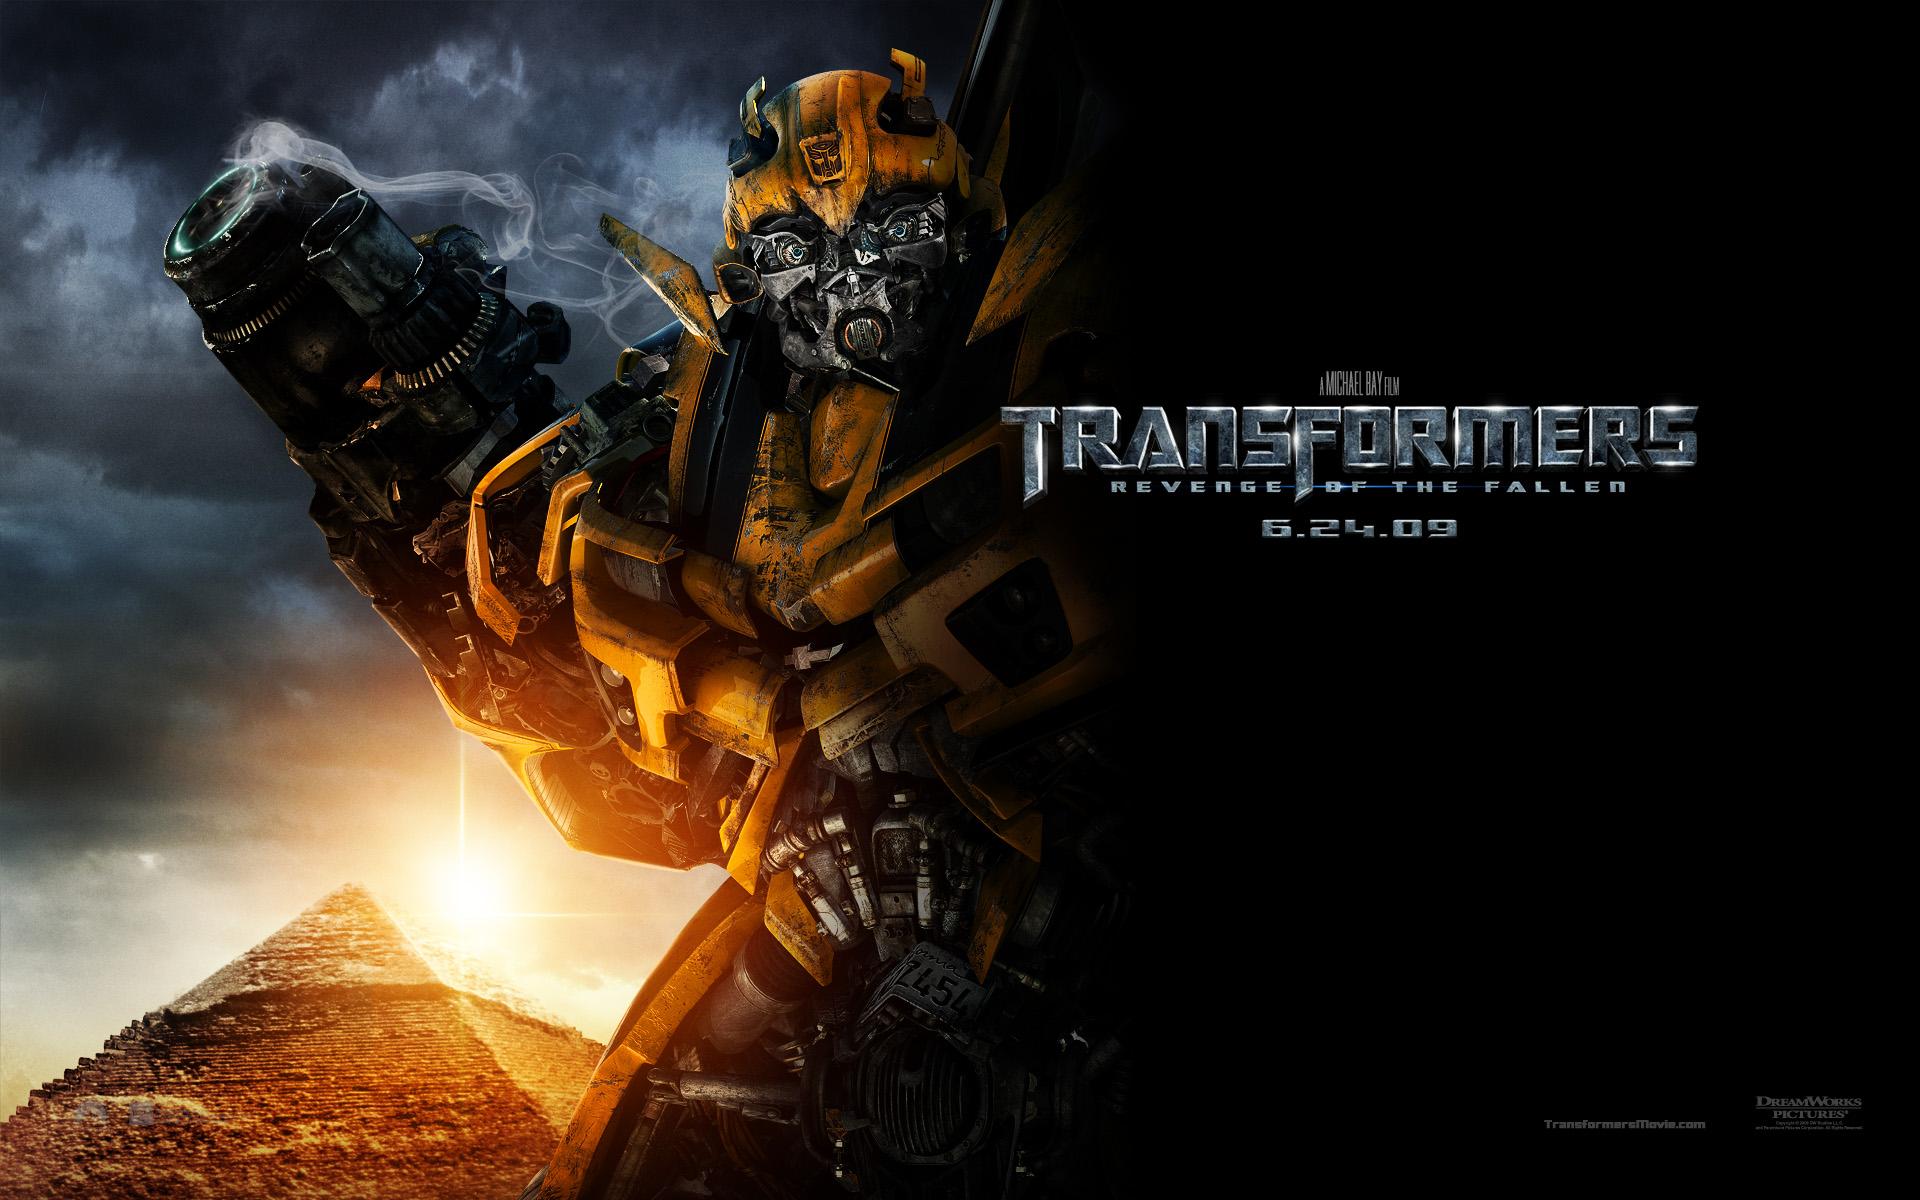 Transformers wallpaper   200652 1920x1200